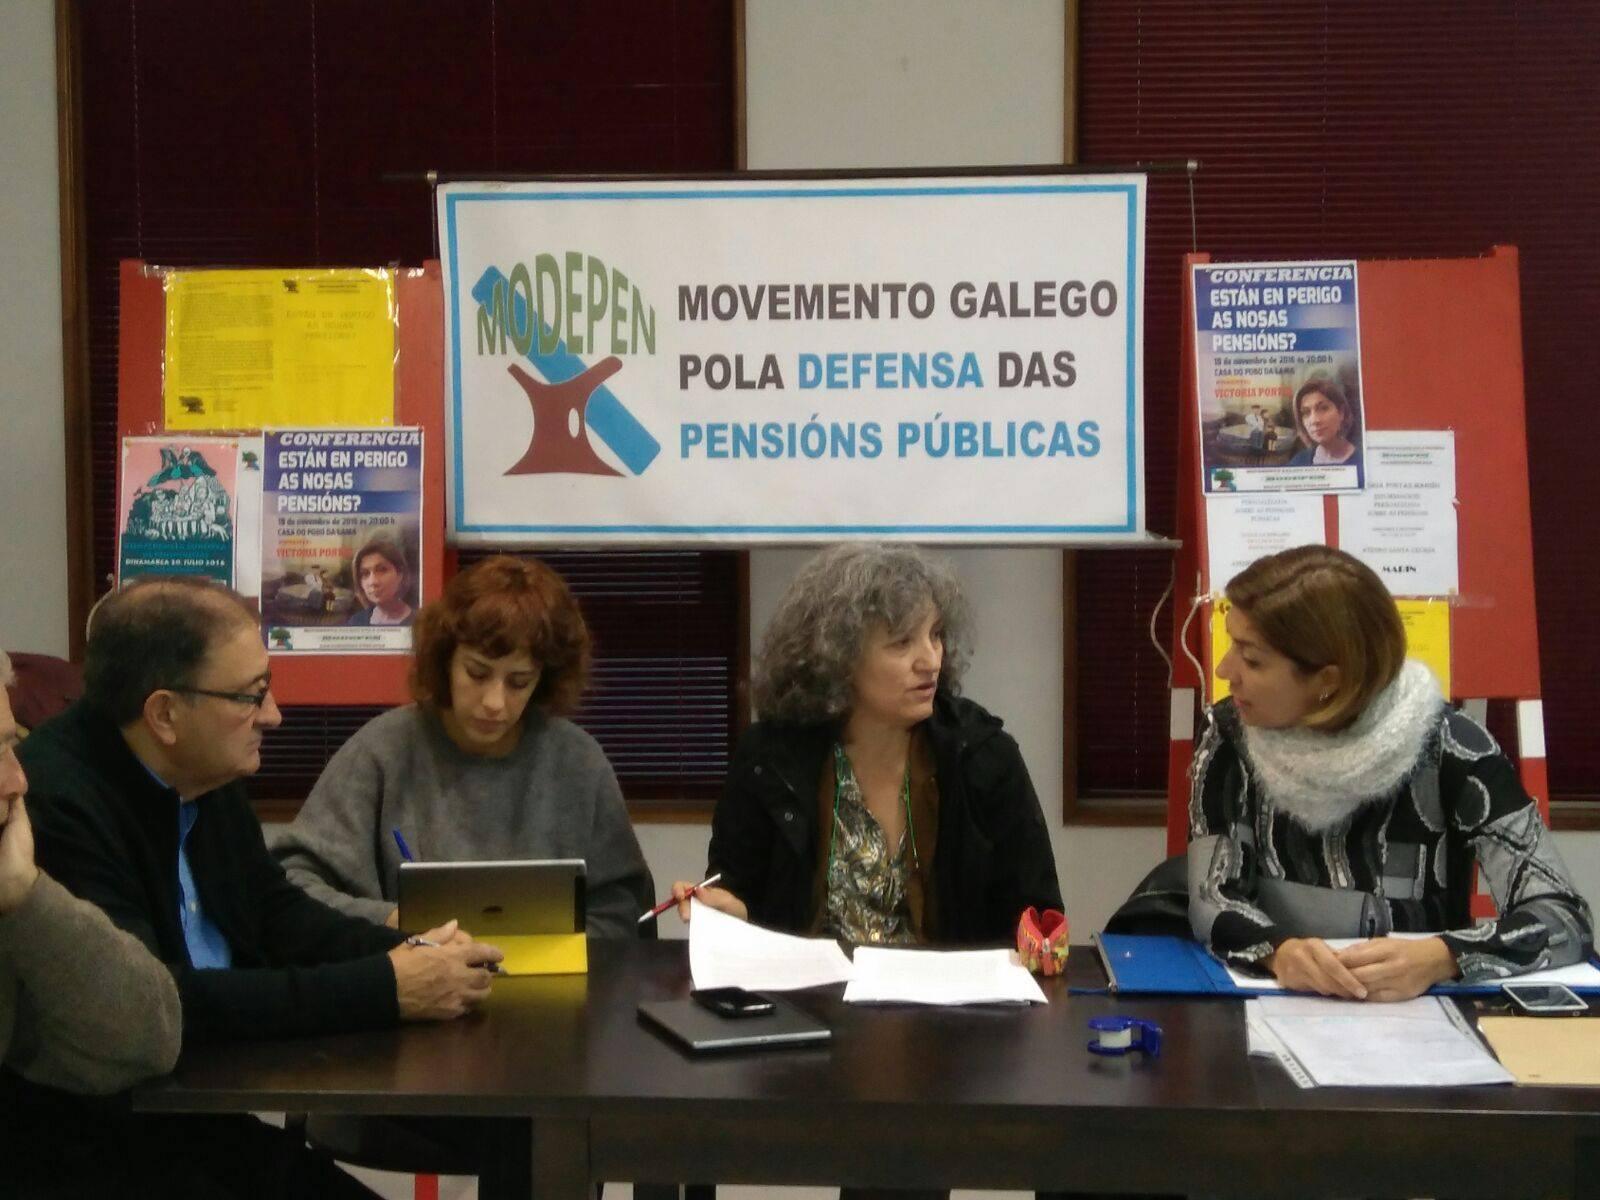 reunion-de-lidia-senra-e-alexandra-fernandez-co-movemento-galego-pola-defensa-das-pensions-publicas-o-sabado-pasado-en-pontevedra